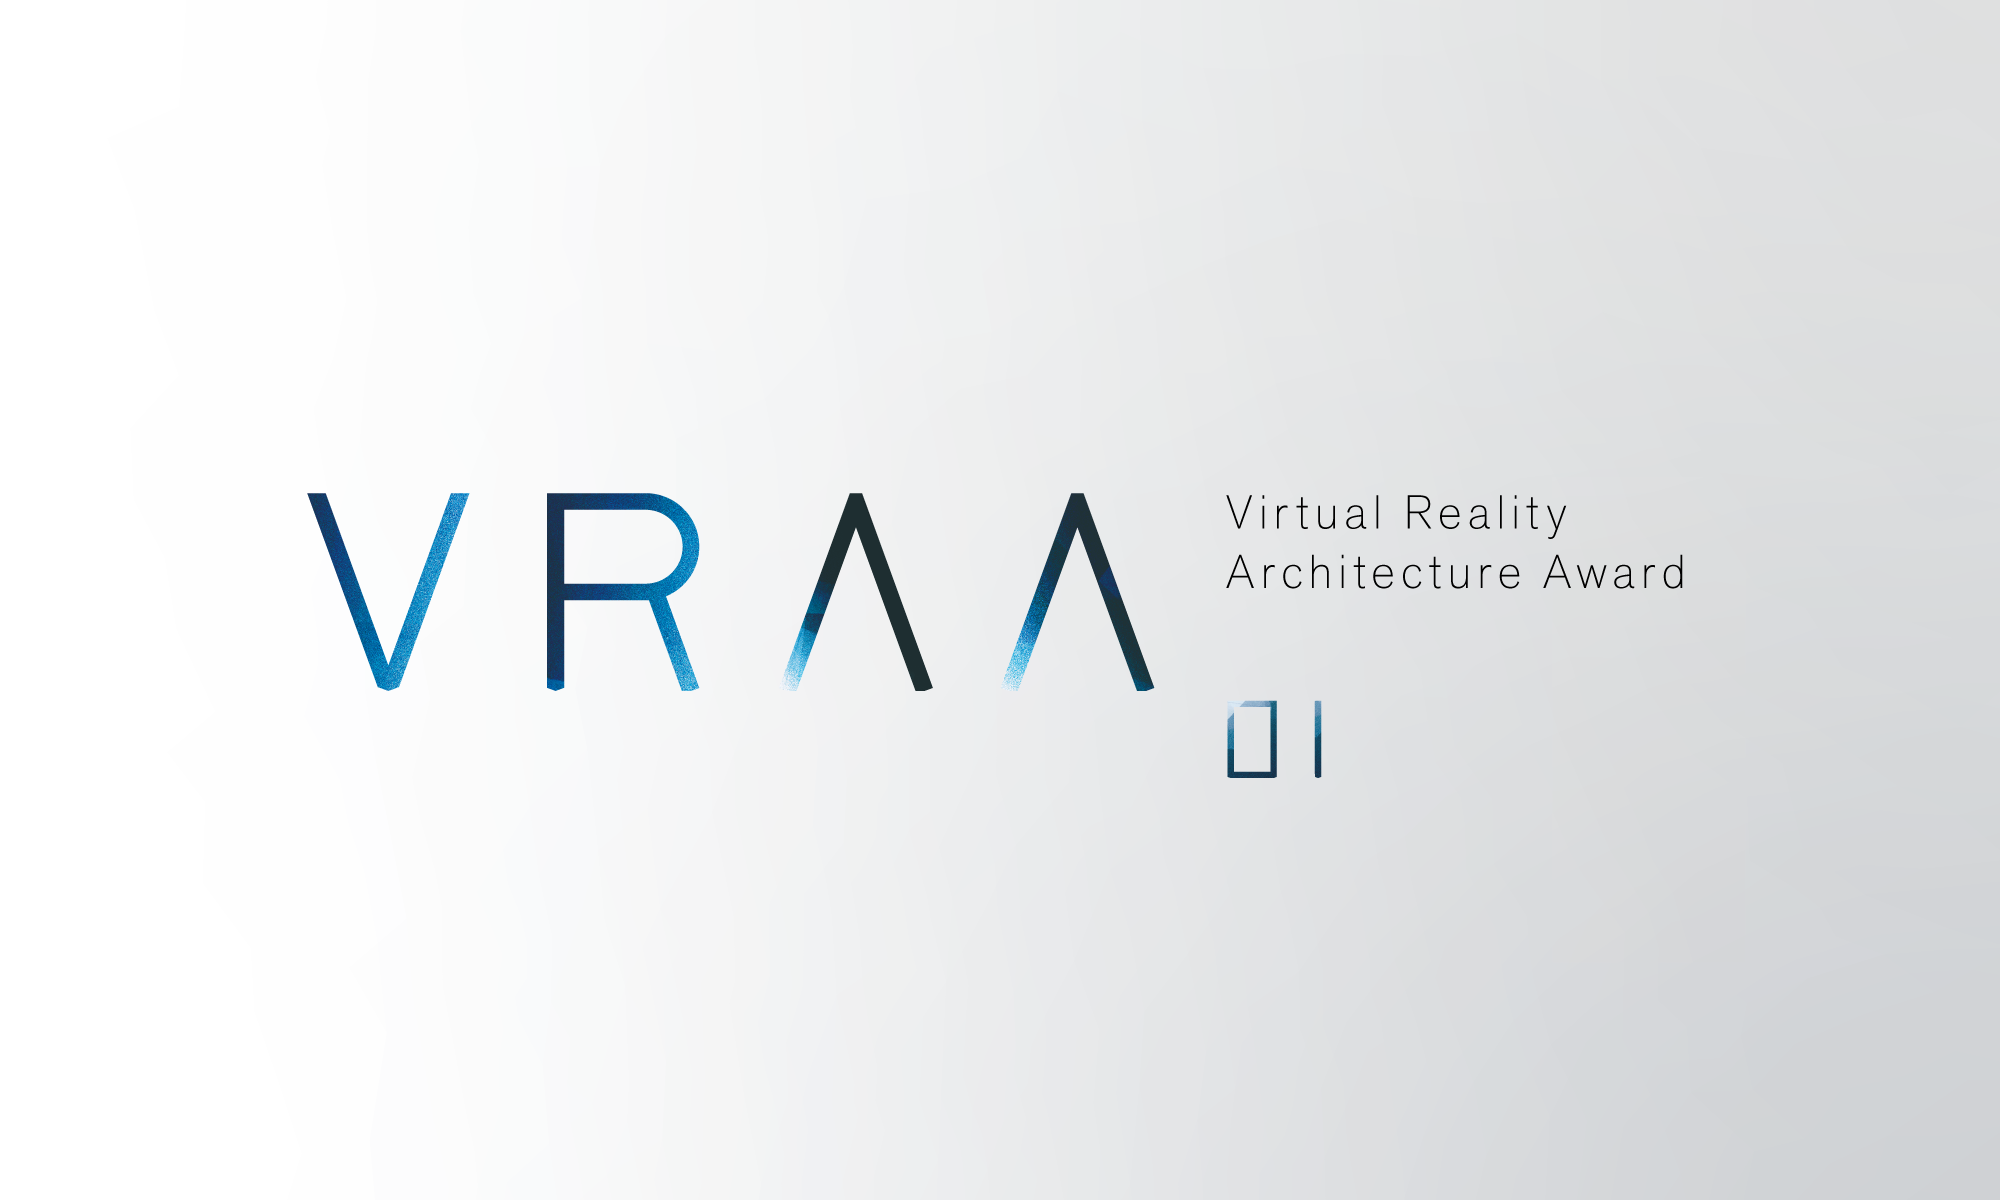 VR Architecture Award(VRAA)01